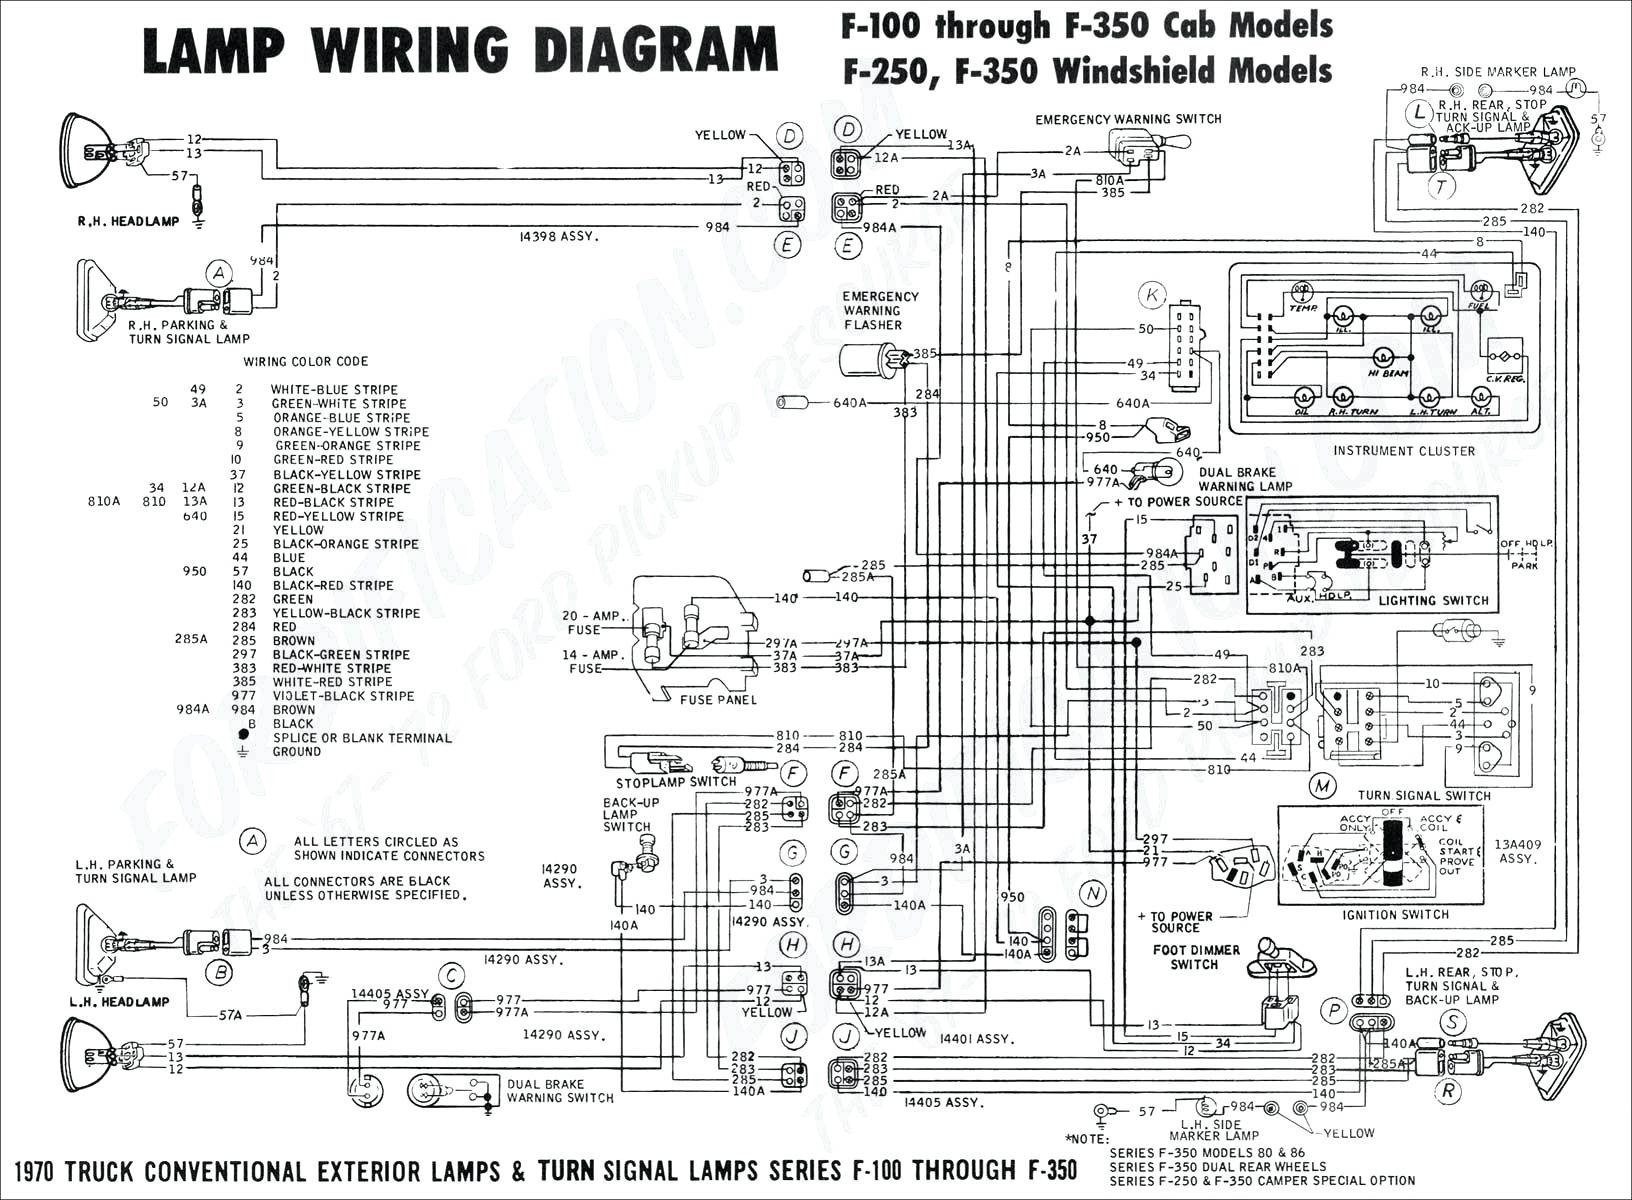 Nissan Titan Trailer Wiring Diagram 2006 Nissan Armada Fuse Diagram Wiring Diagram Used Of Nissan Titan Trailer Wiring Diagram